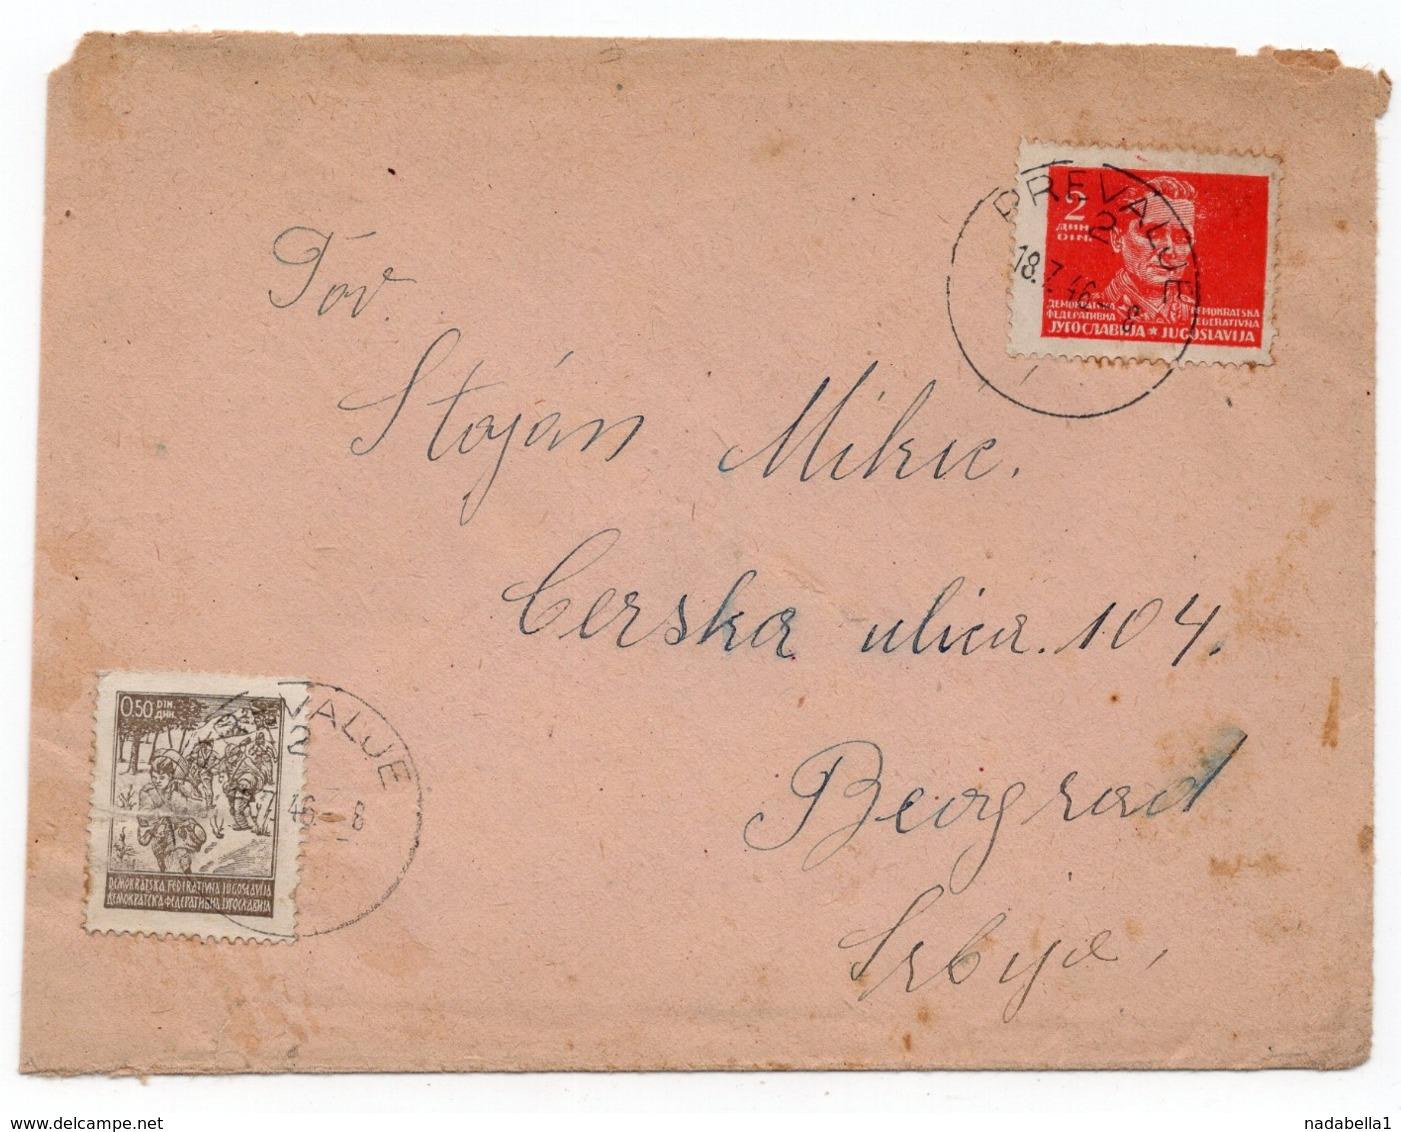 18.07.1946. YUGOSLAVIA, SLOVENIA, KORUSKA, PREVALJE TO BELGRADE, TITO - 1945-1992 Socialistische Federale Republiek Joegoslavië